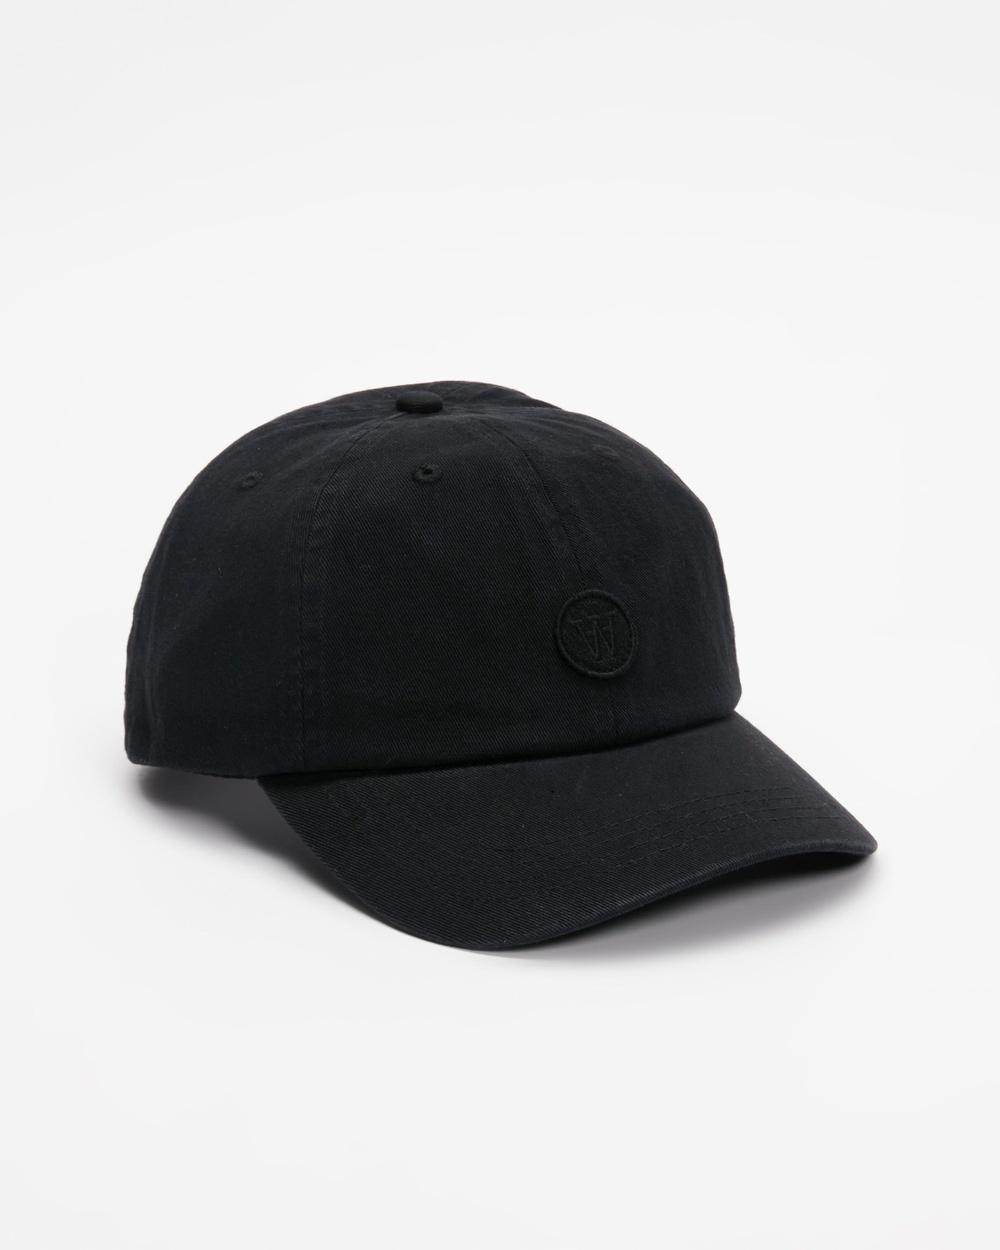 Wood Eli Cap Headwear Black